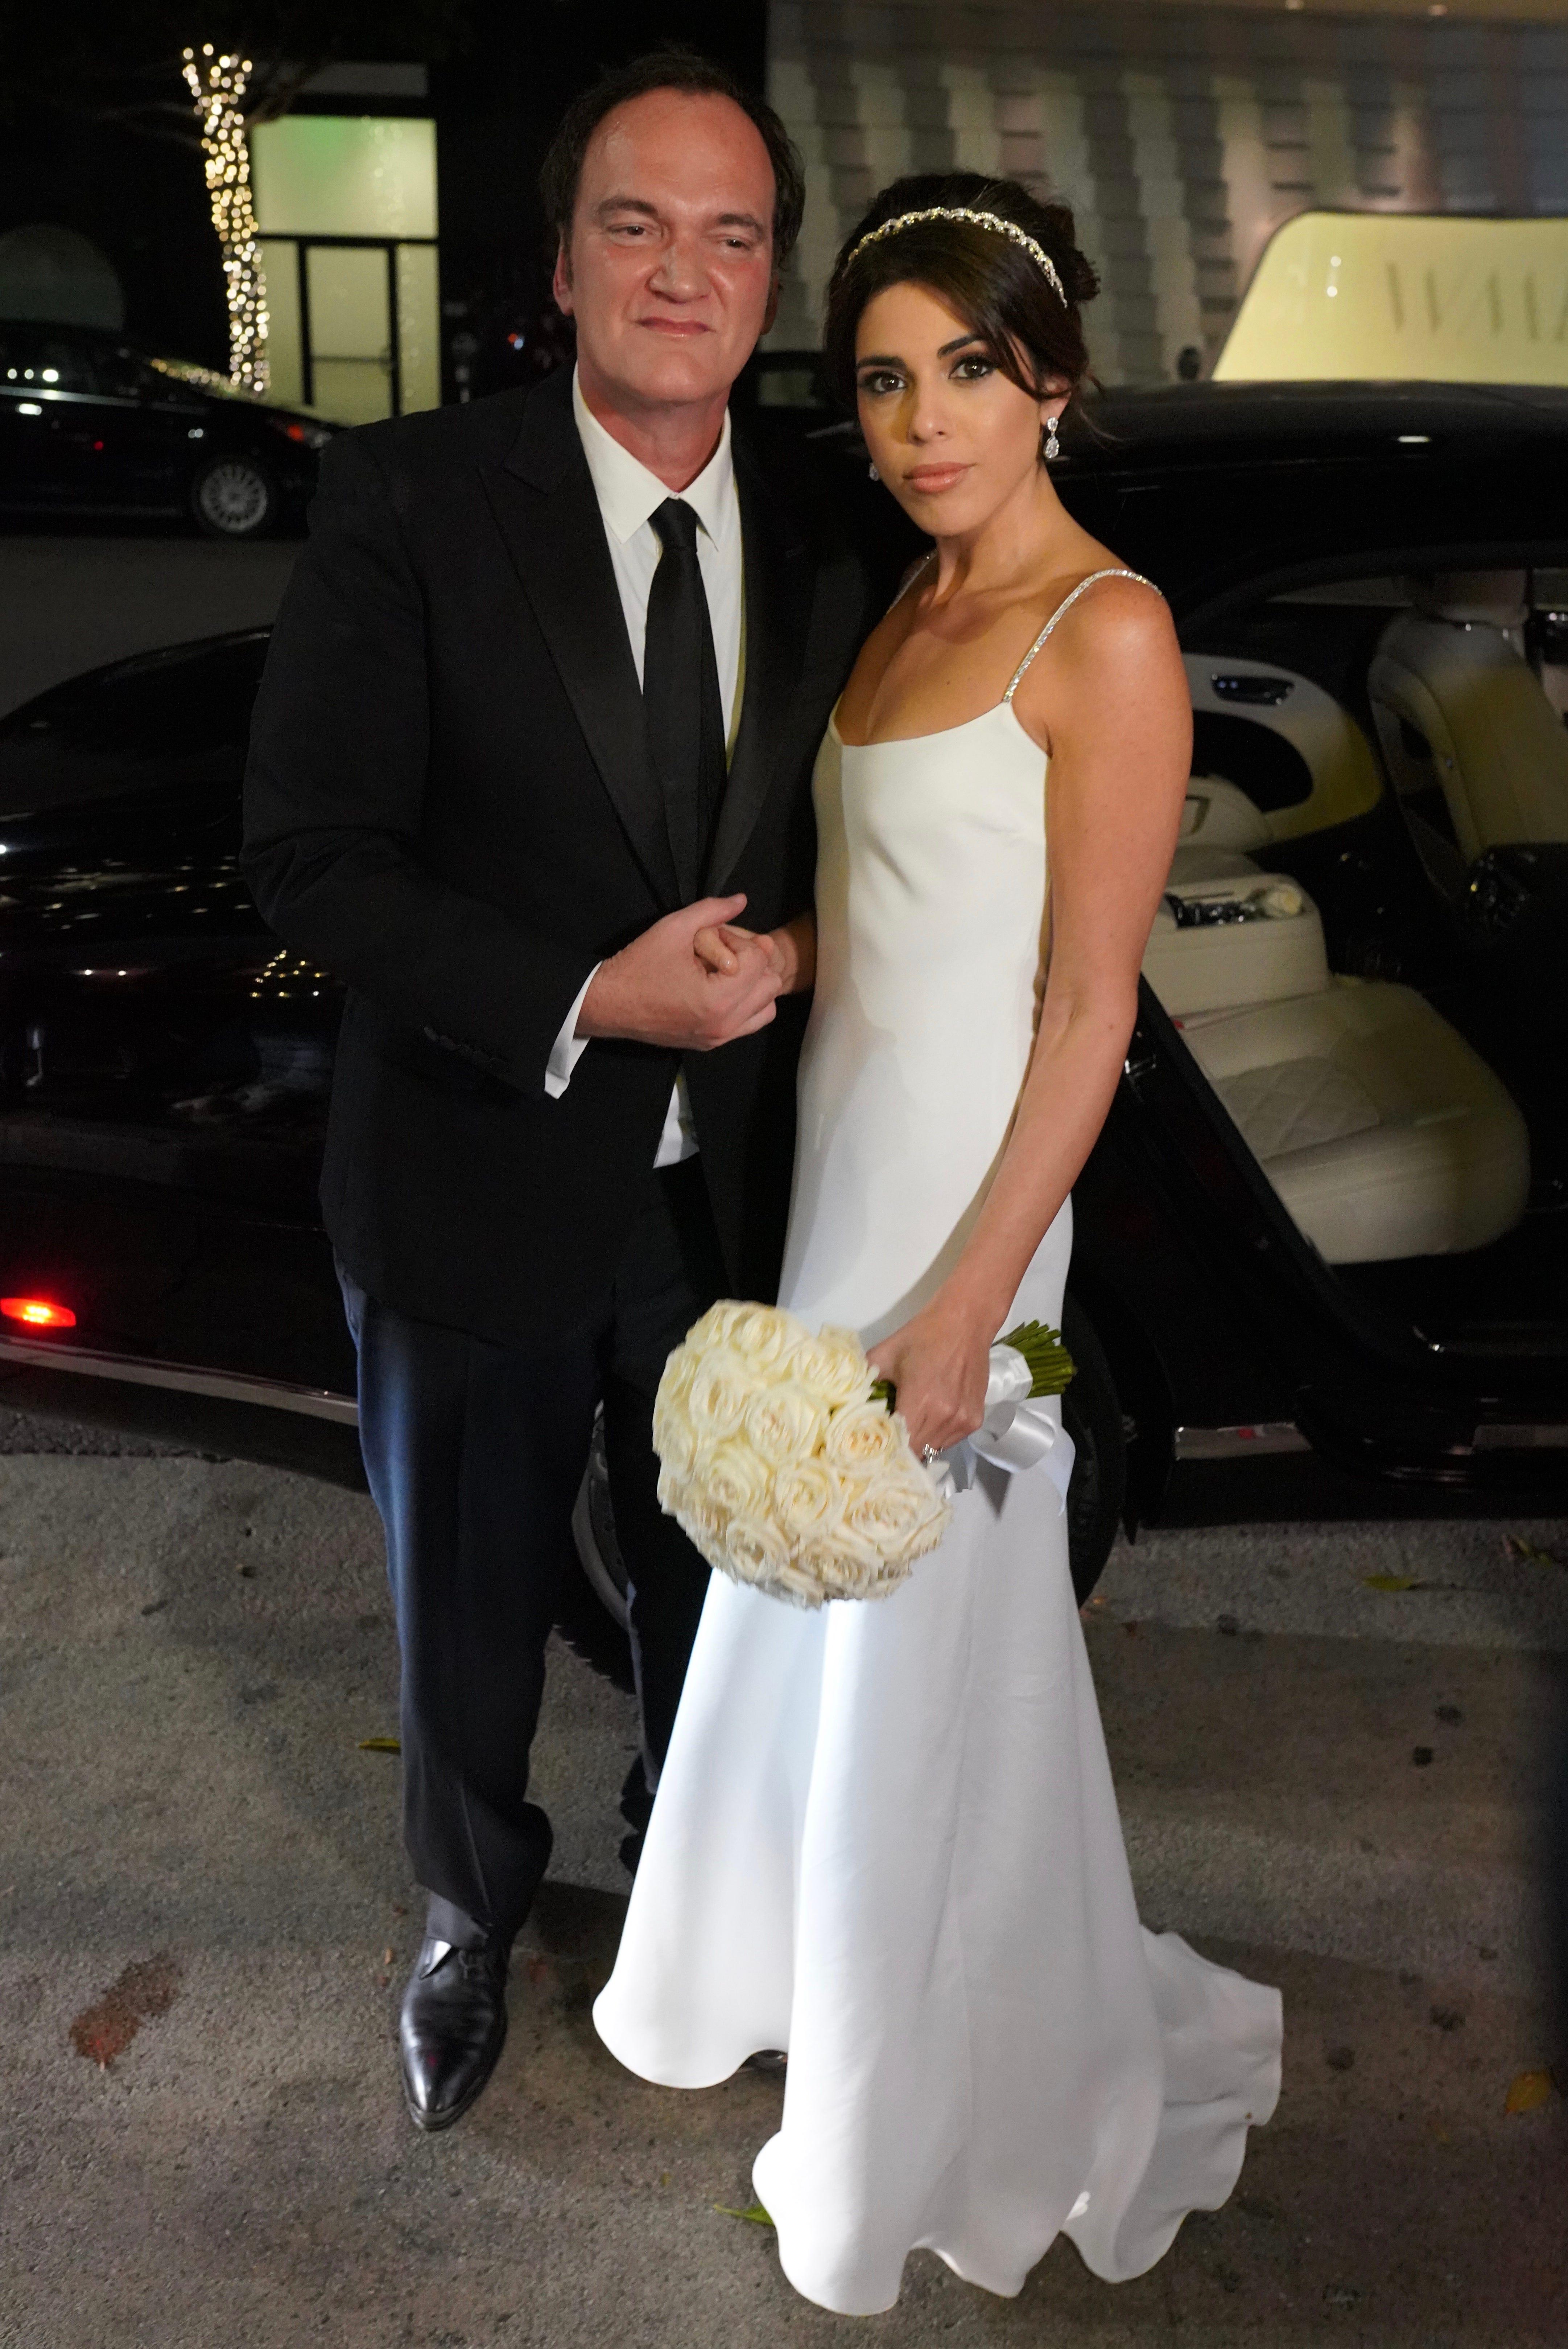 Quentin Tarantino ties the knot with Israeli model/singer Daniella Pick